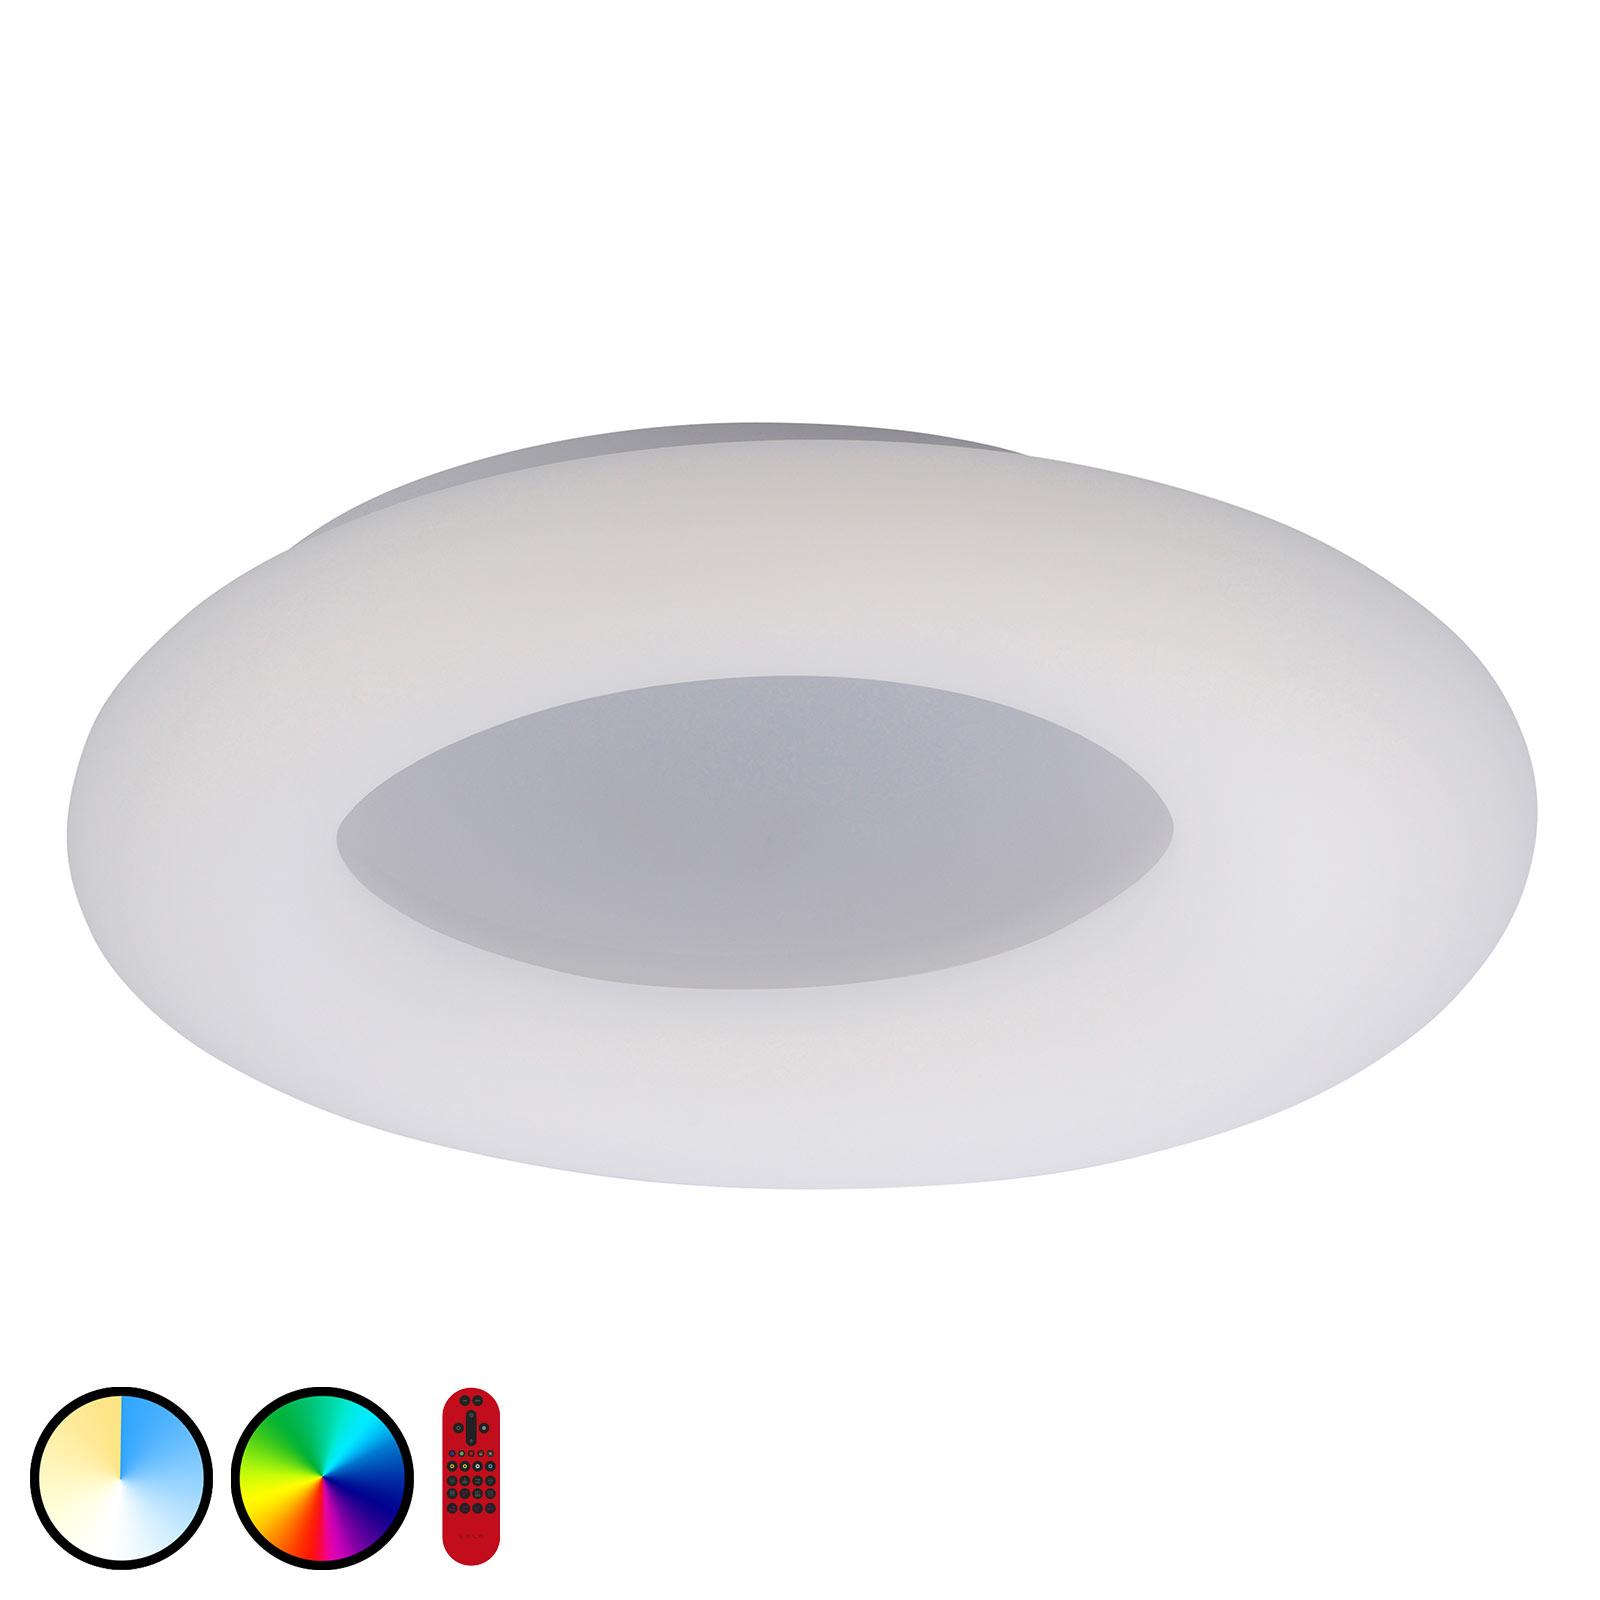 Lampa sufitowa LED LOLAsmart Donut, Ø 60 cm